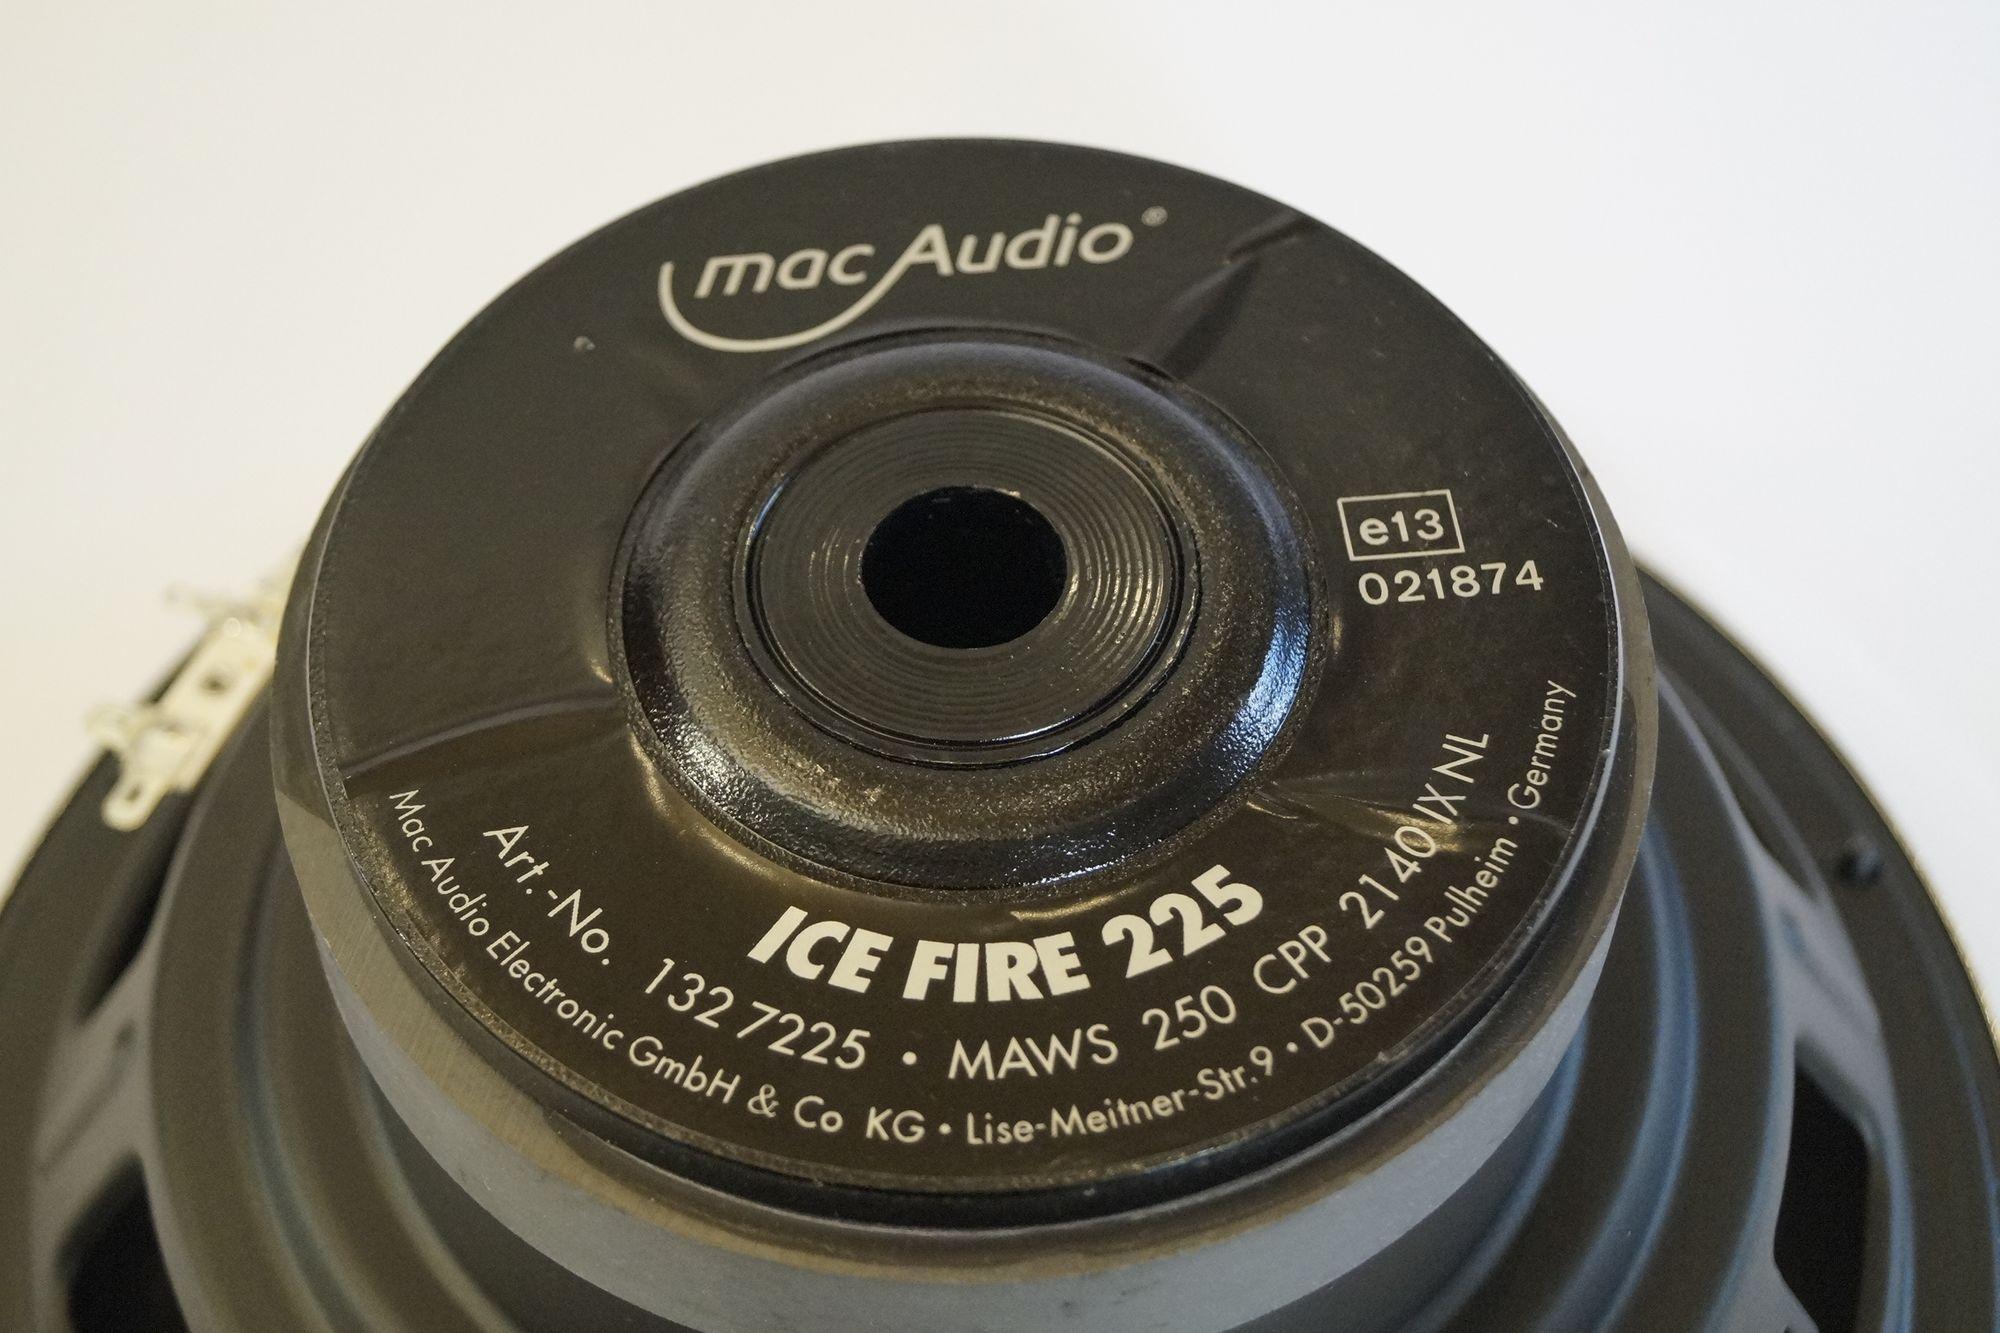 1 Stück Mac Audio ICE FIRE 225 MAWS 250 CPP 2140 IX NL, SERVICEWARE – Bild 3